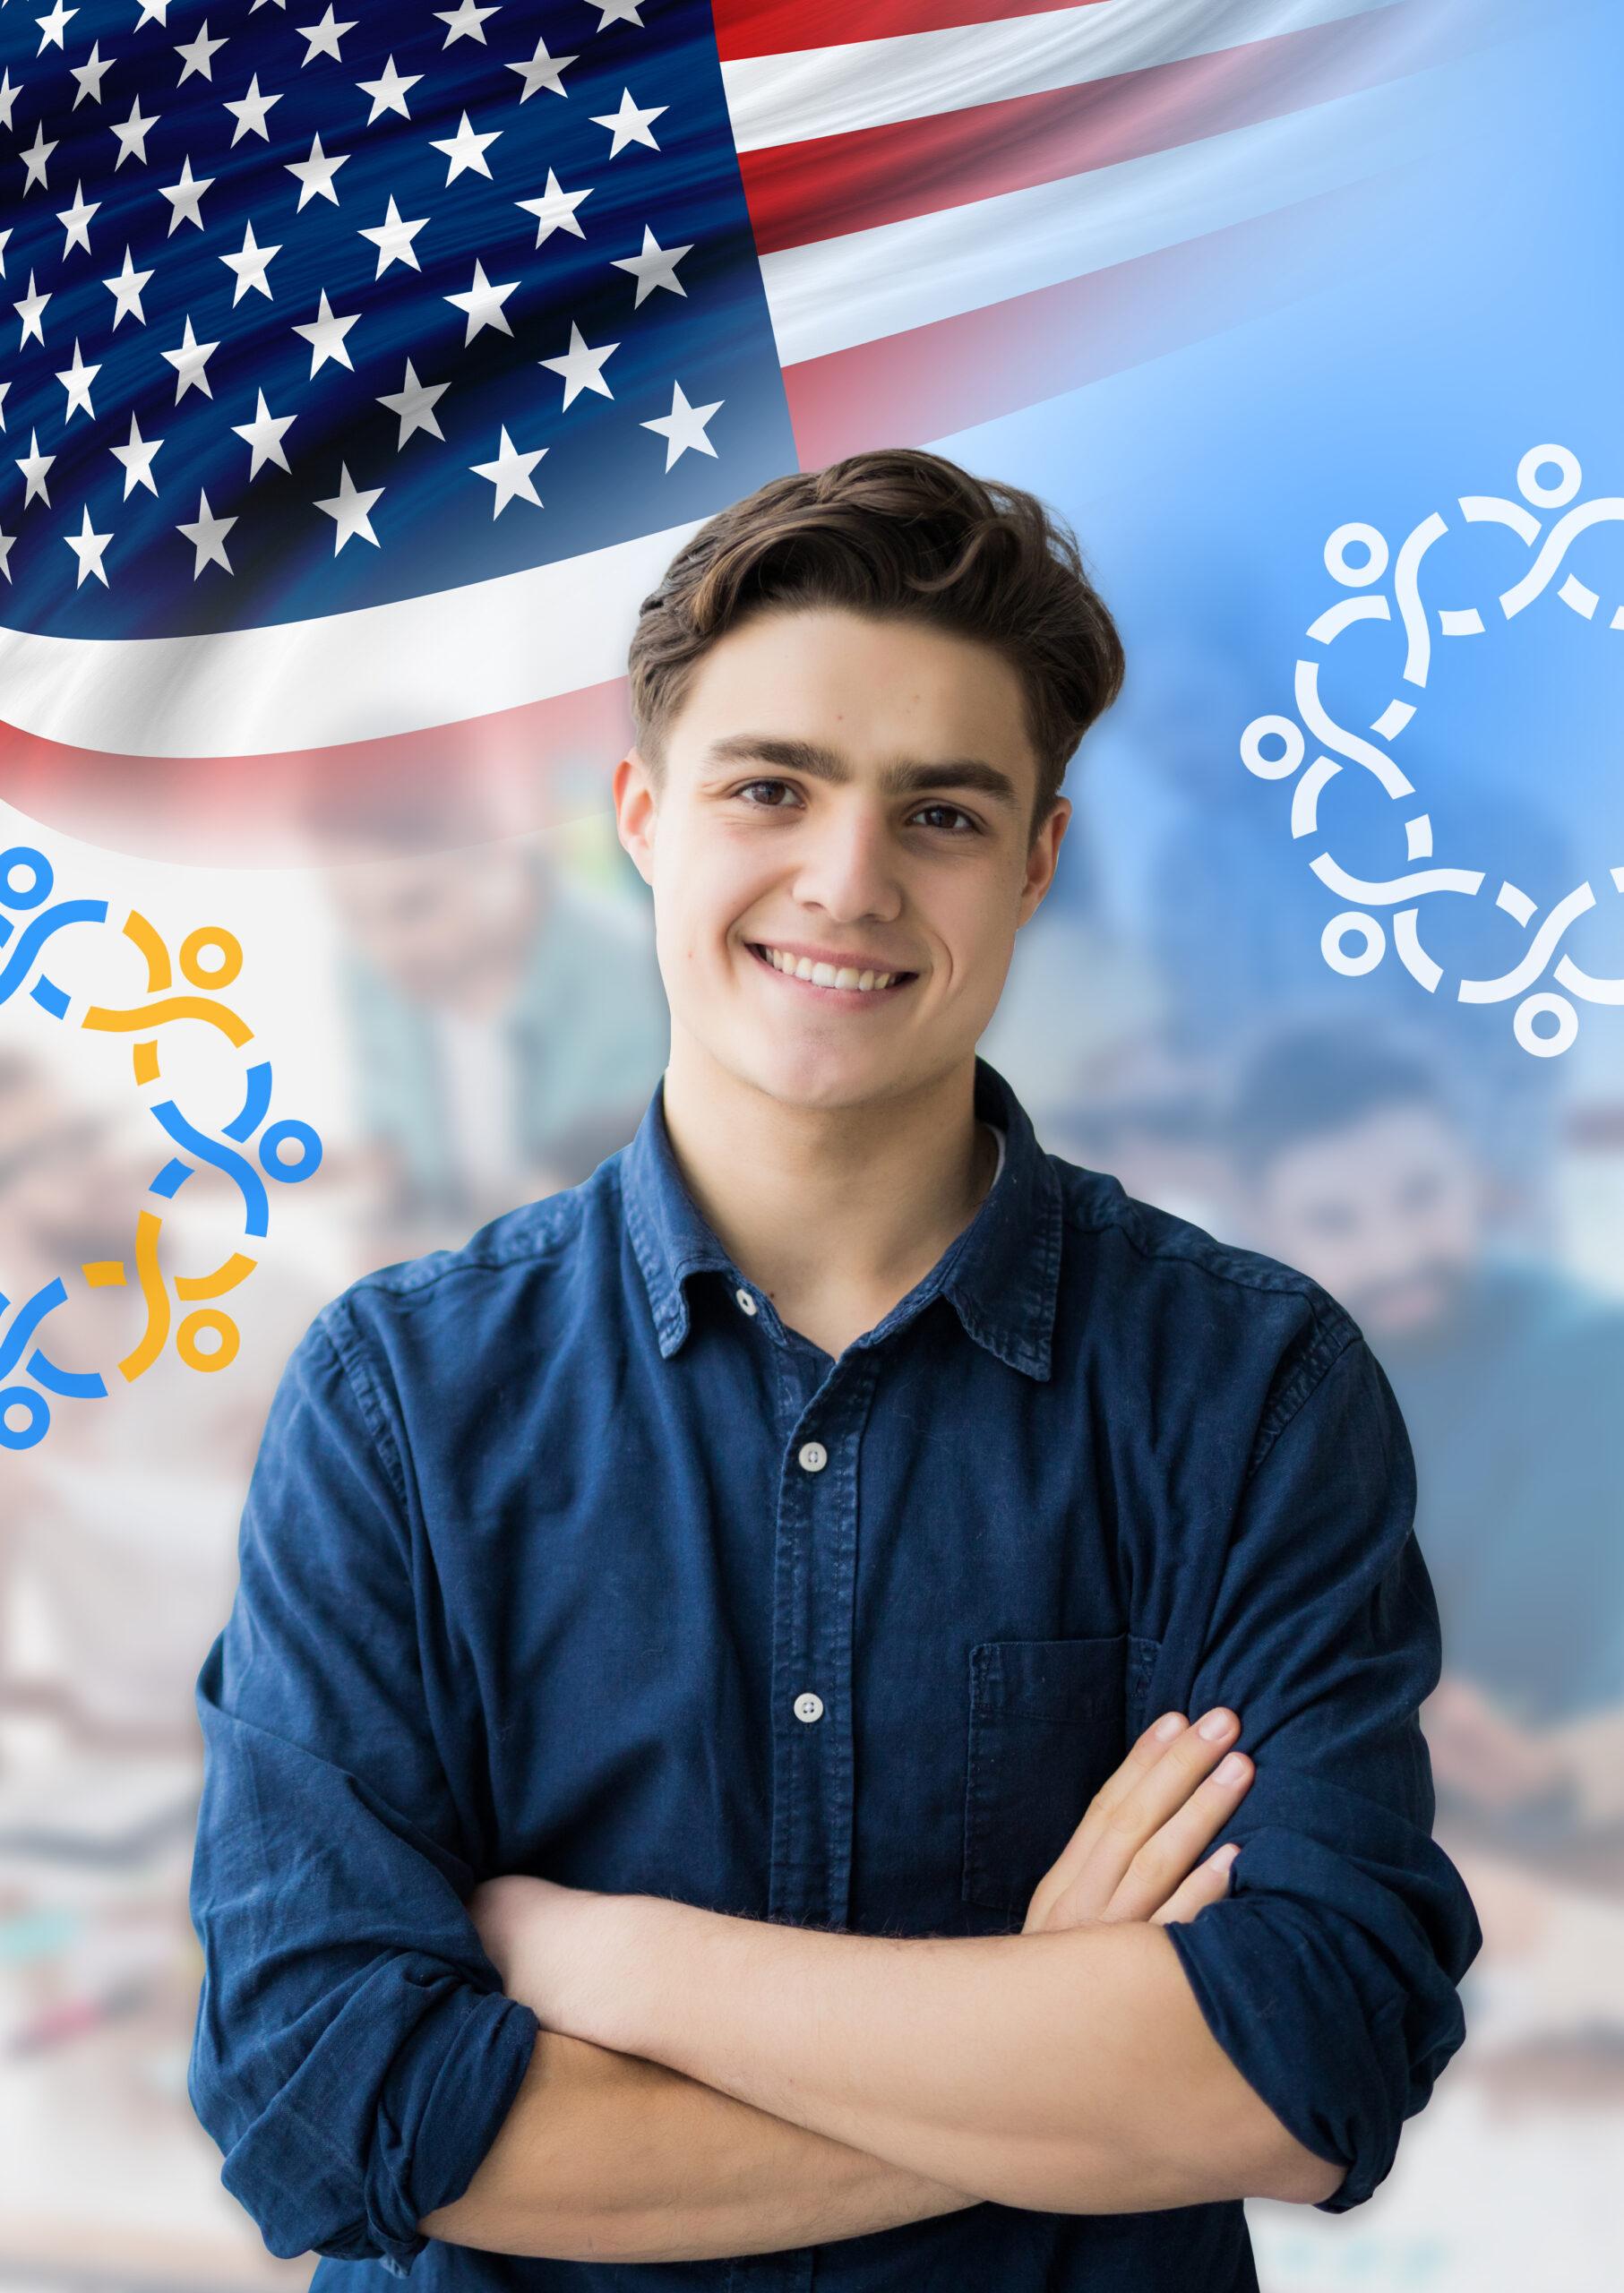 Internship/Trainee USA